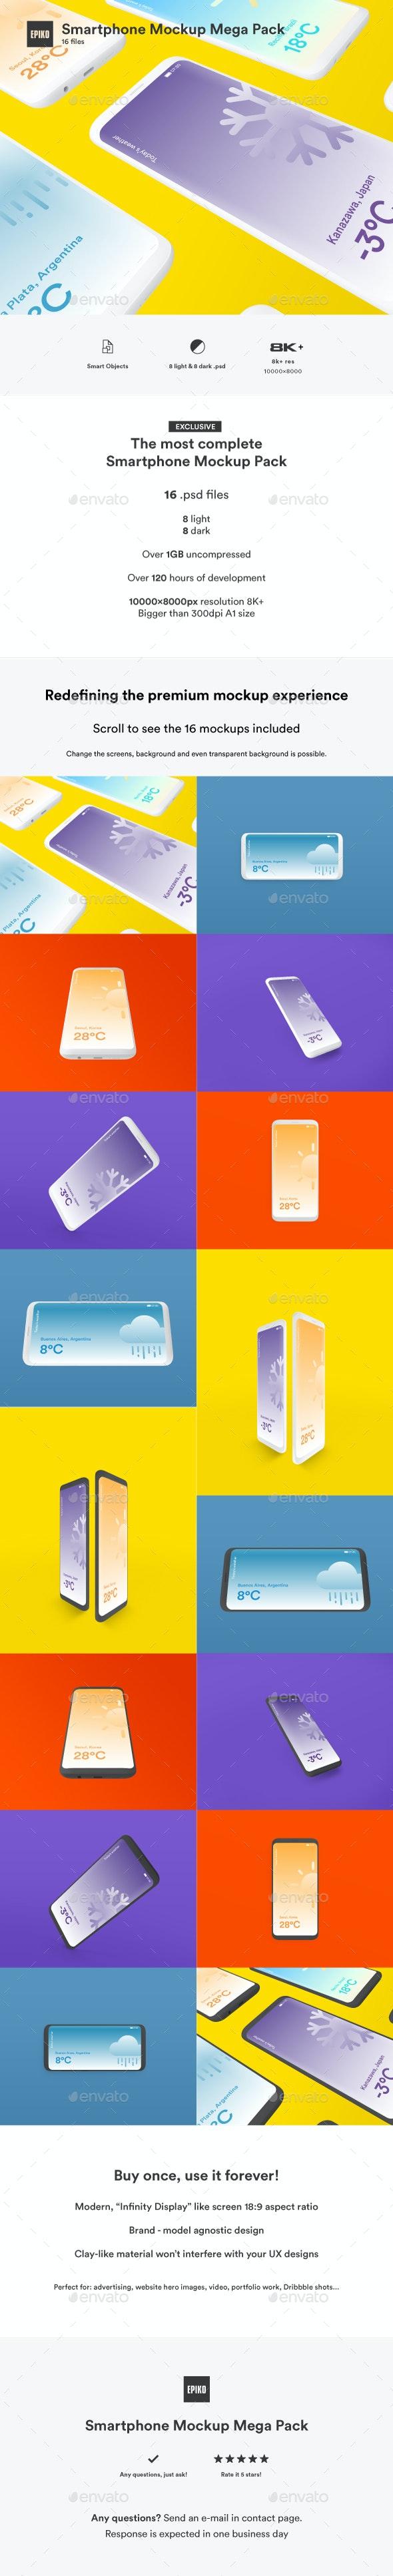 Smartphone Mockup Pack Light and Dark - Mobile Displays